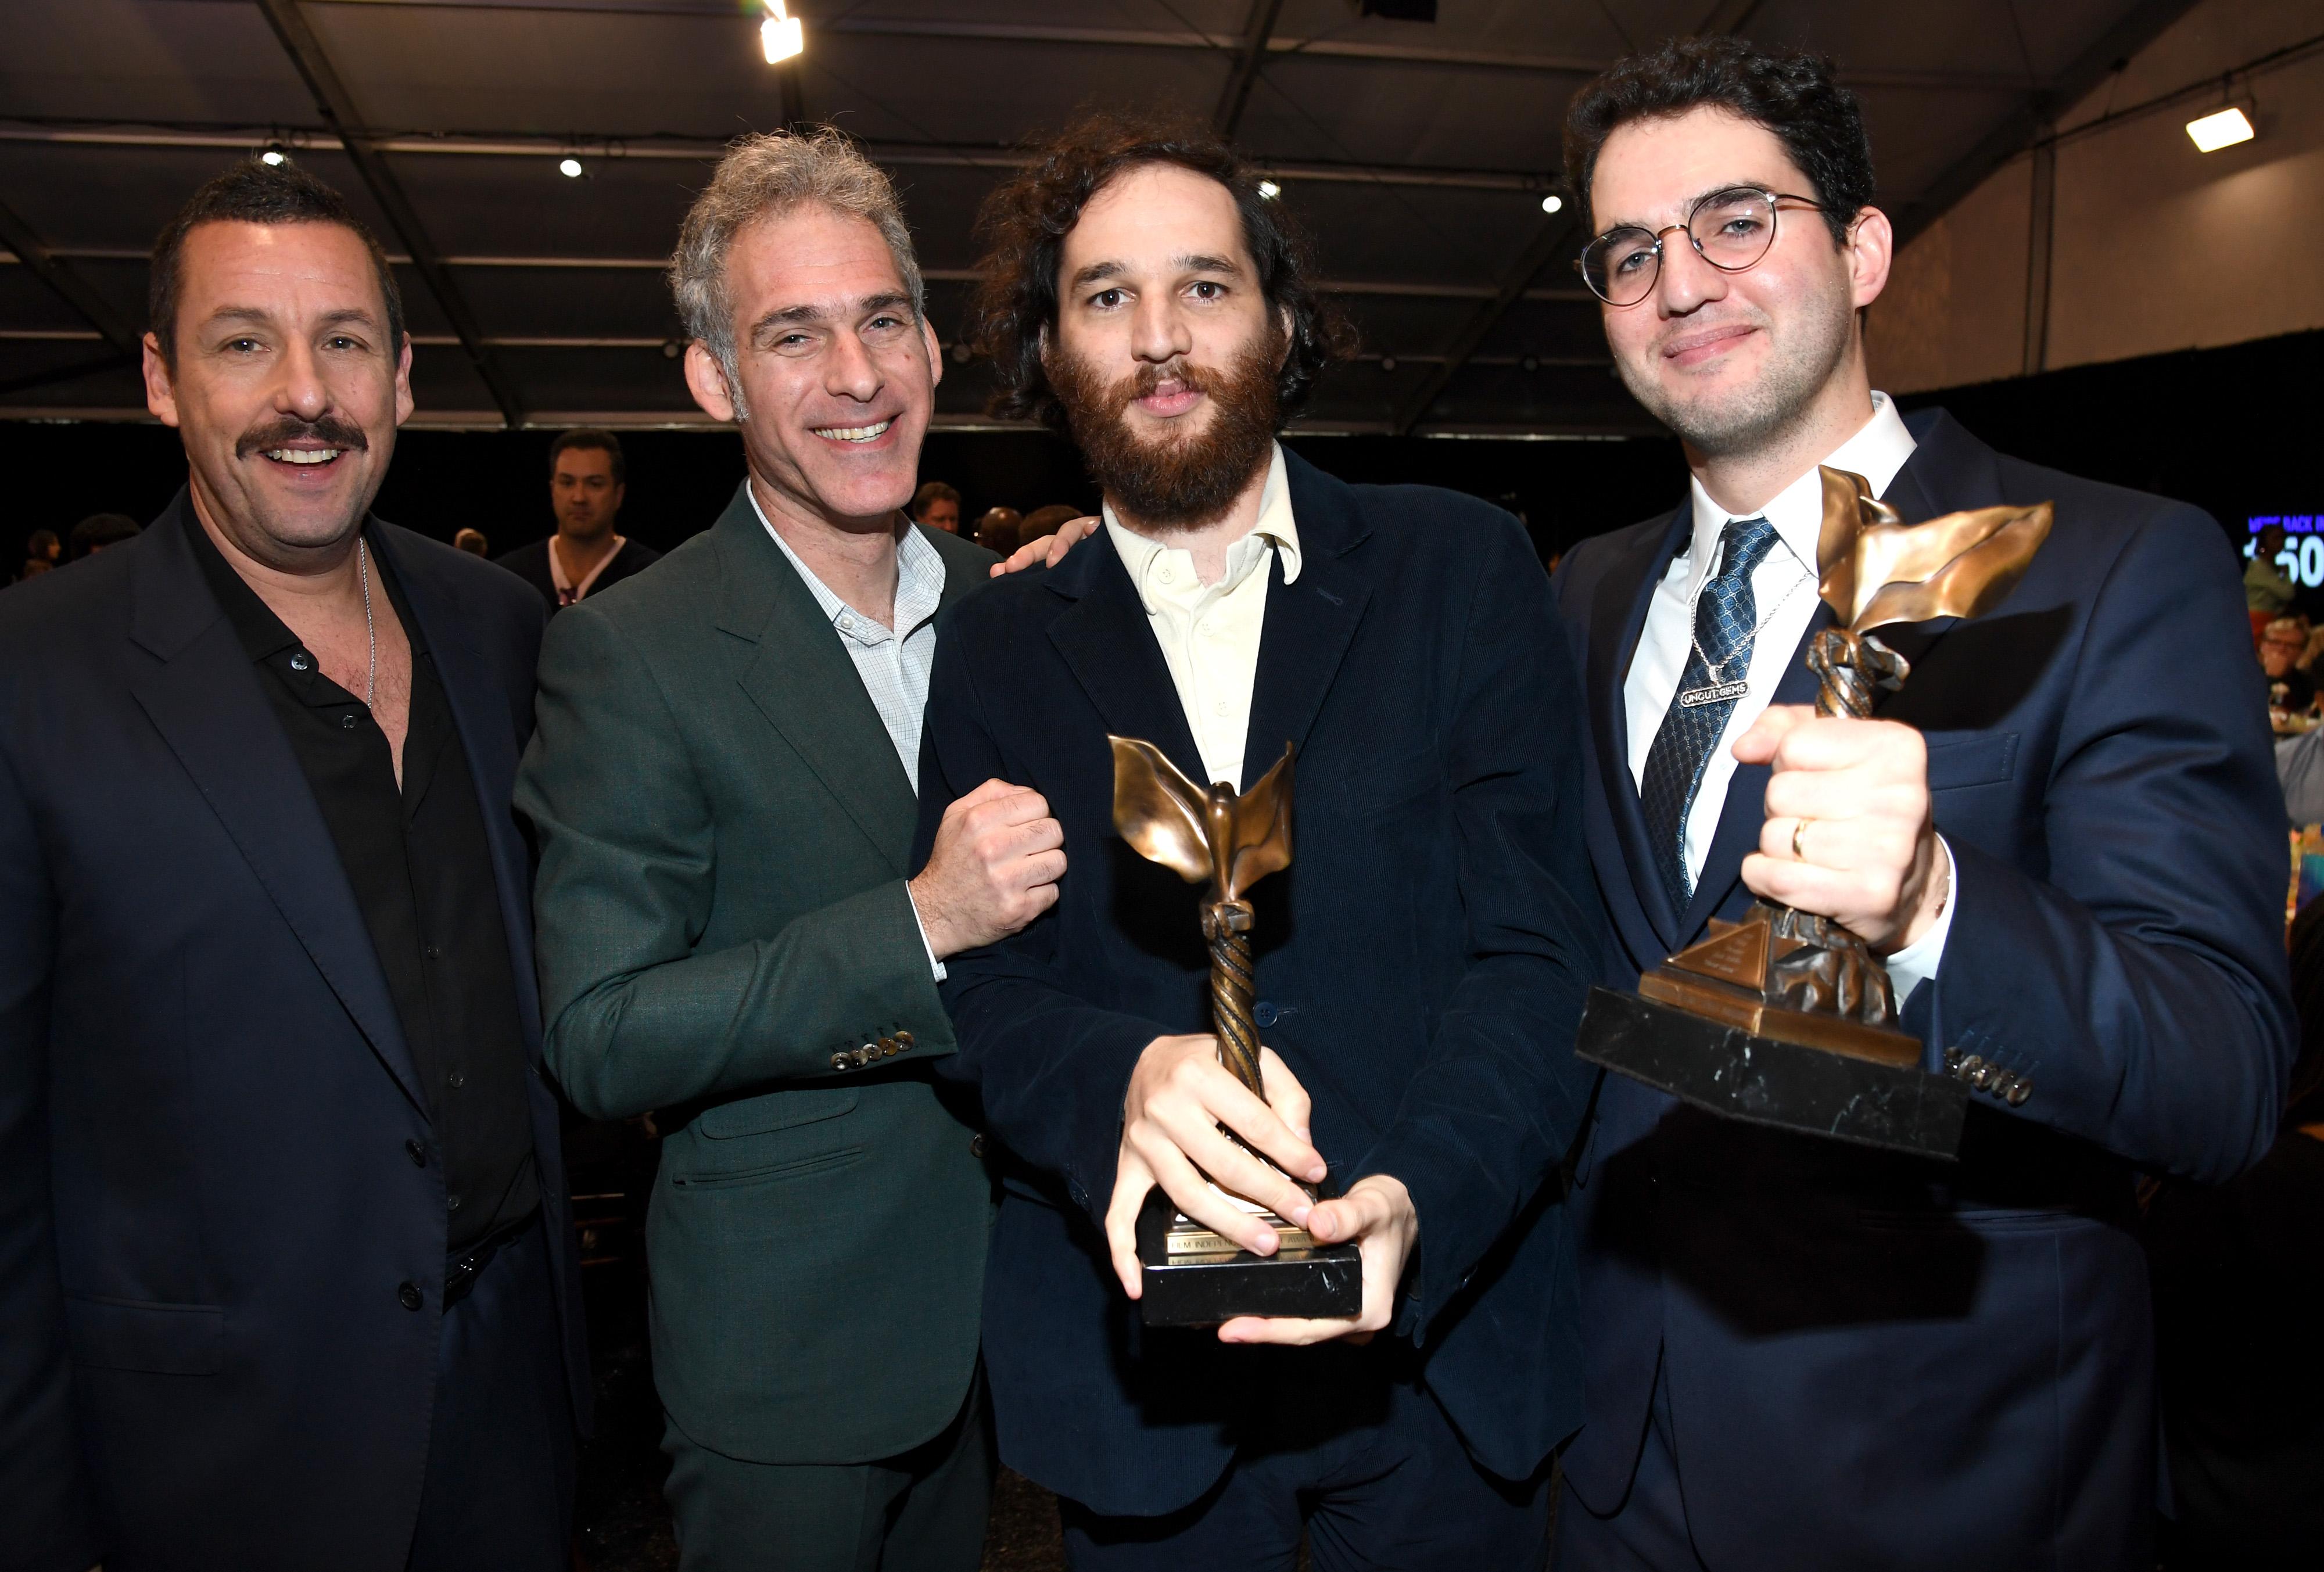 Adam Sandler, Josh Safdie, Benny Safdie, and Ronald Bronstein at an event for 35th Film Independent Spirit Awards (2020)